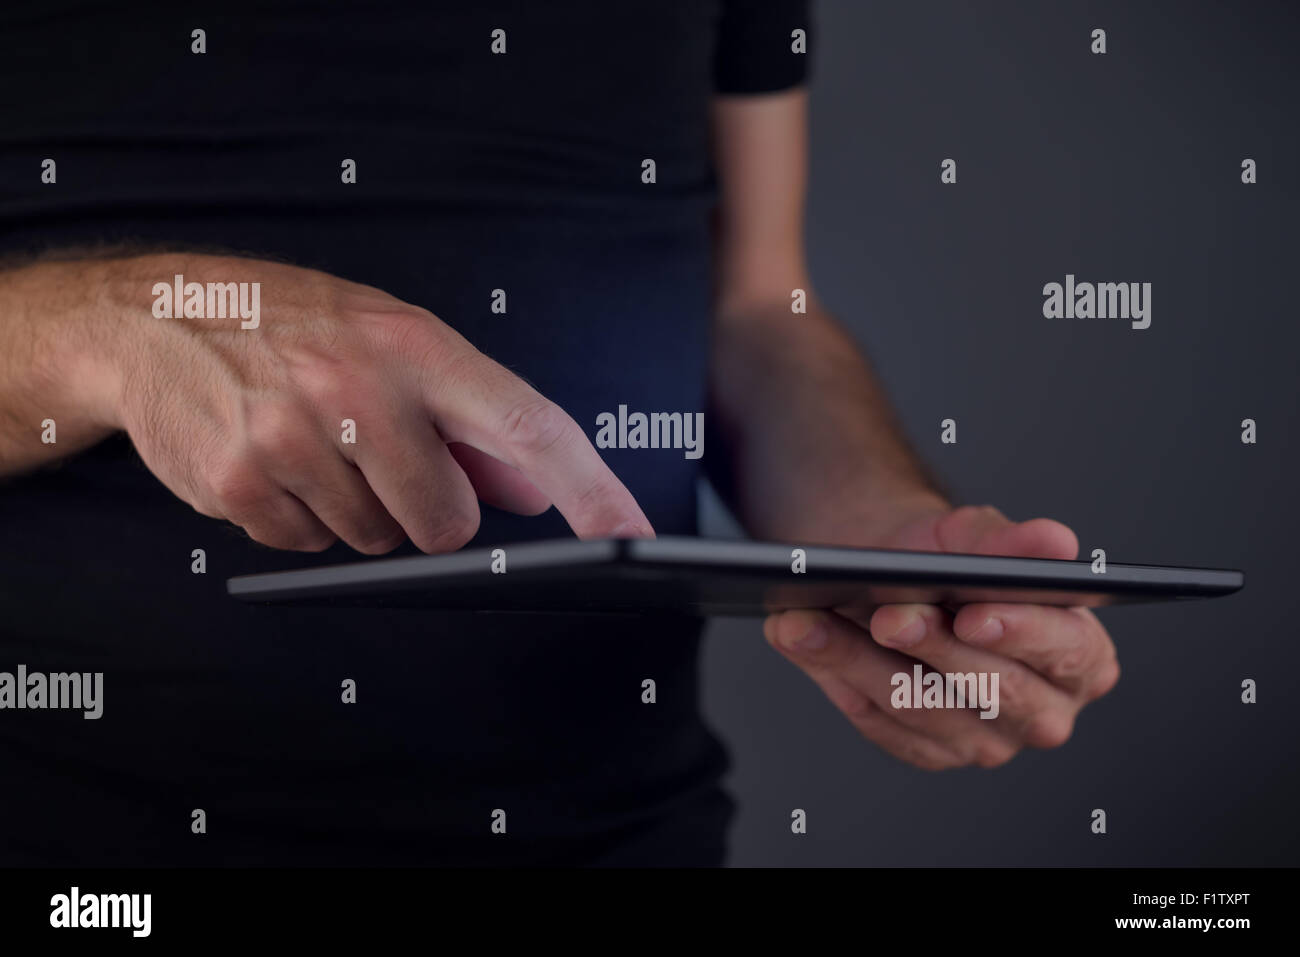 Digital-Tablette Computernutzung, Mann Tippen Touchscreen bewegliche Elektronik-Technik-Gadget, Nahaufnahme von Stockbild